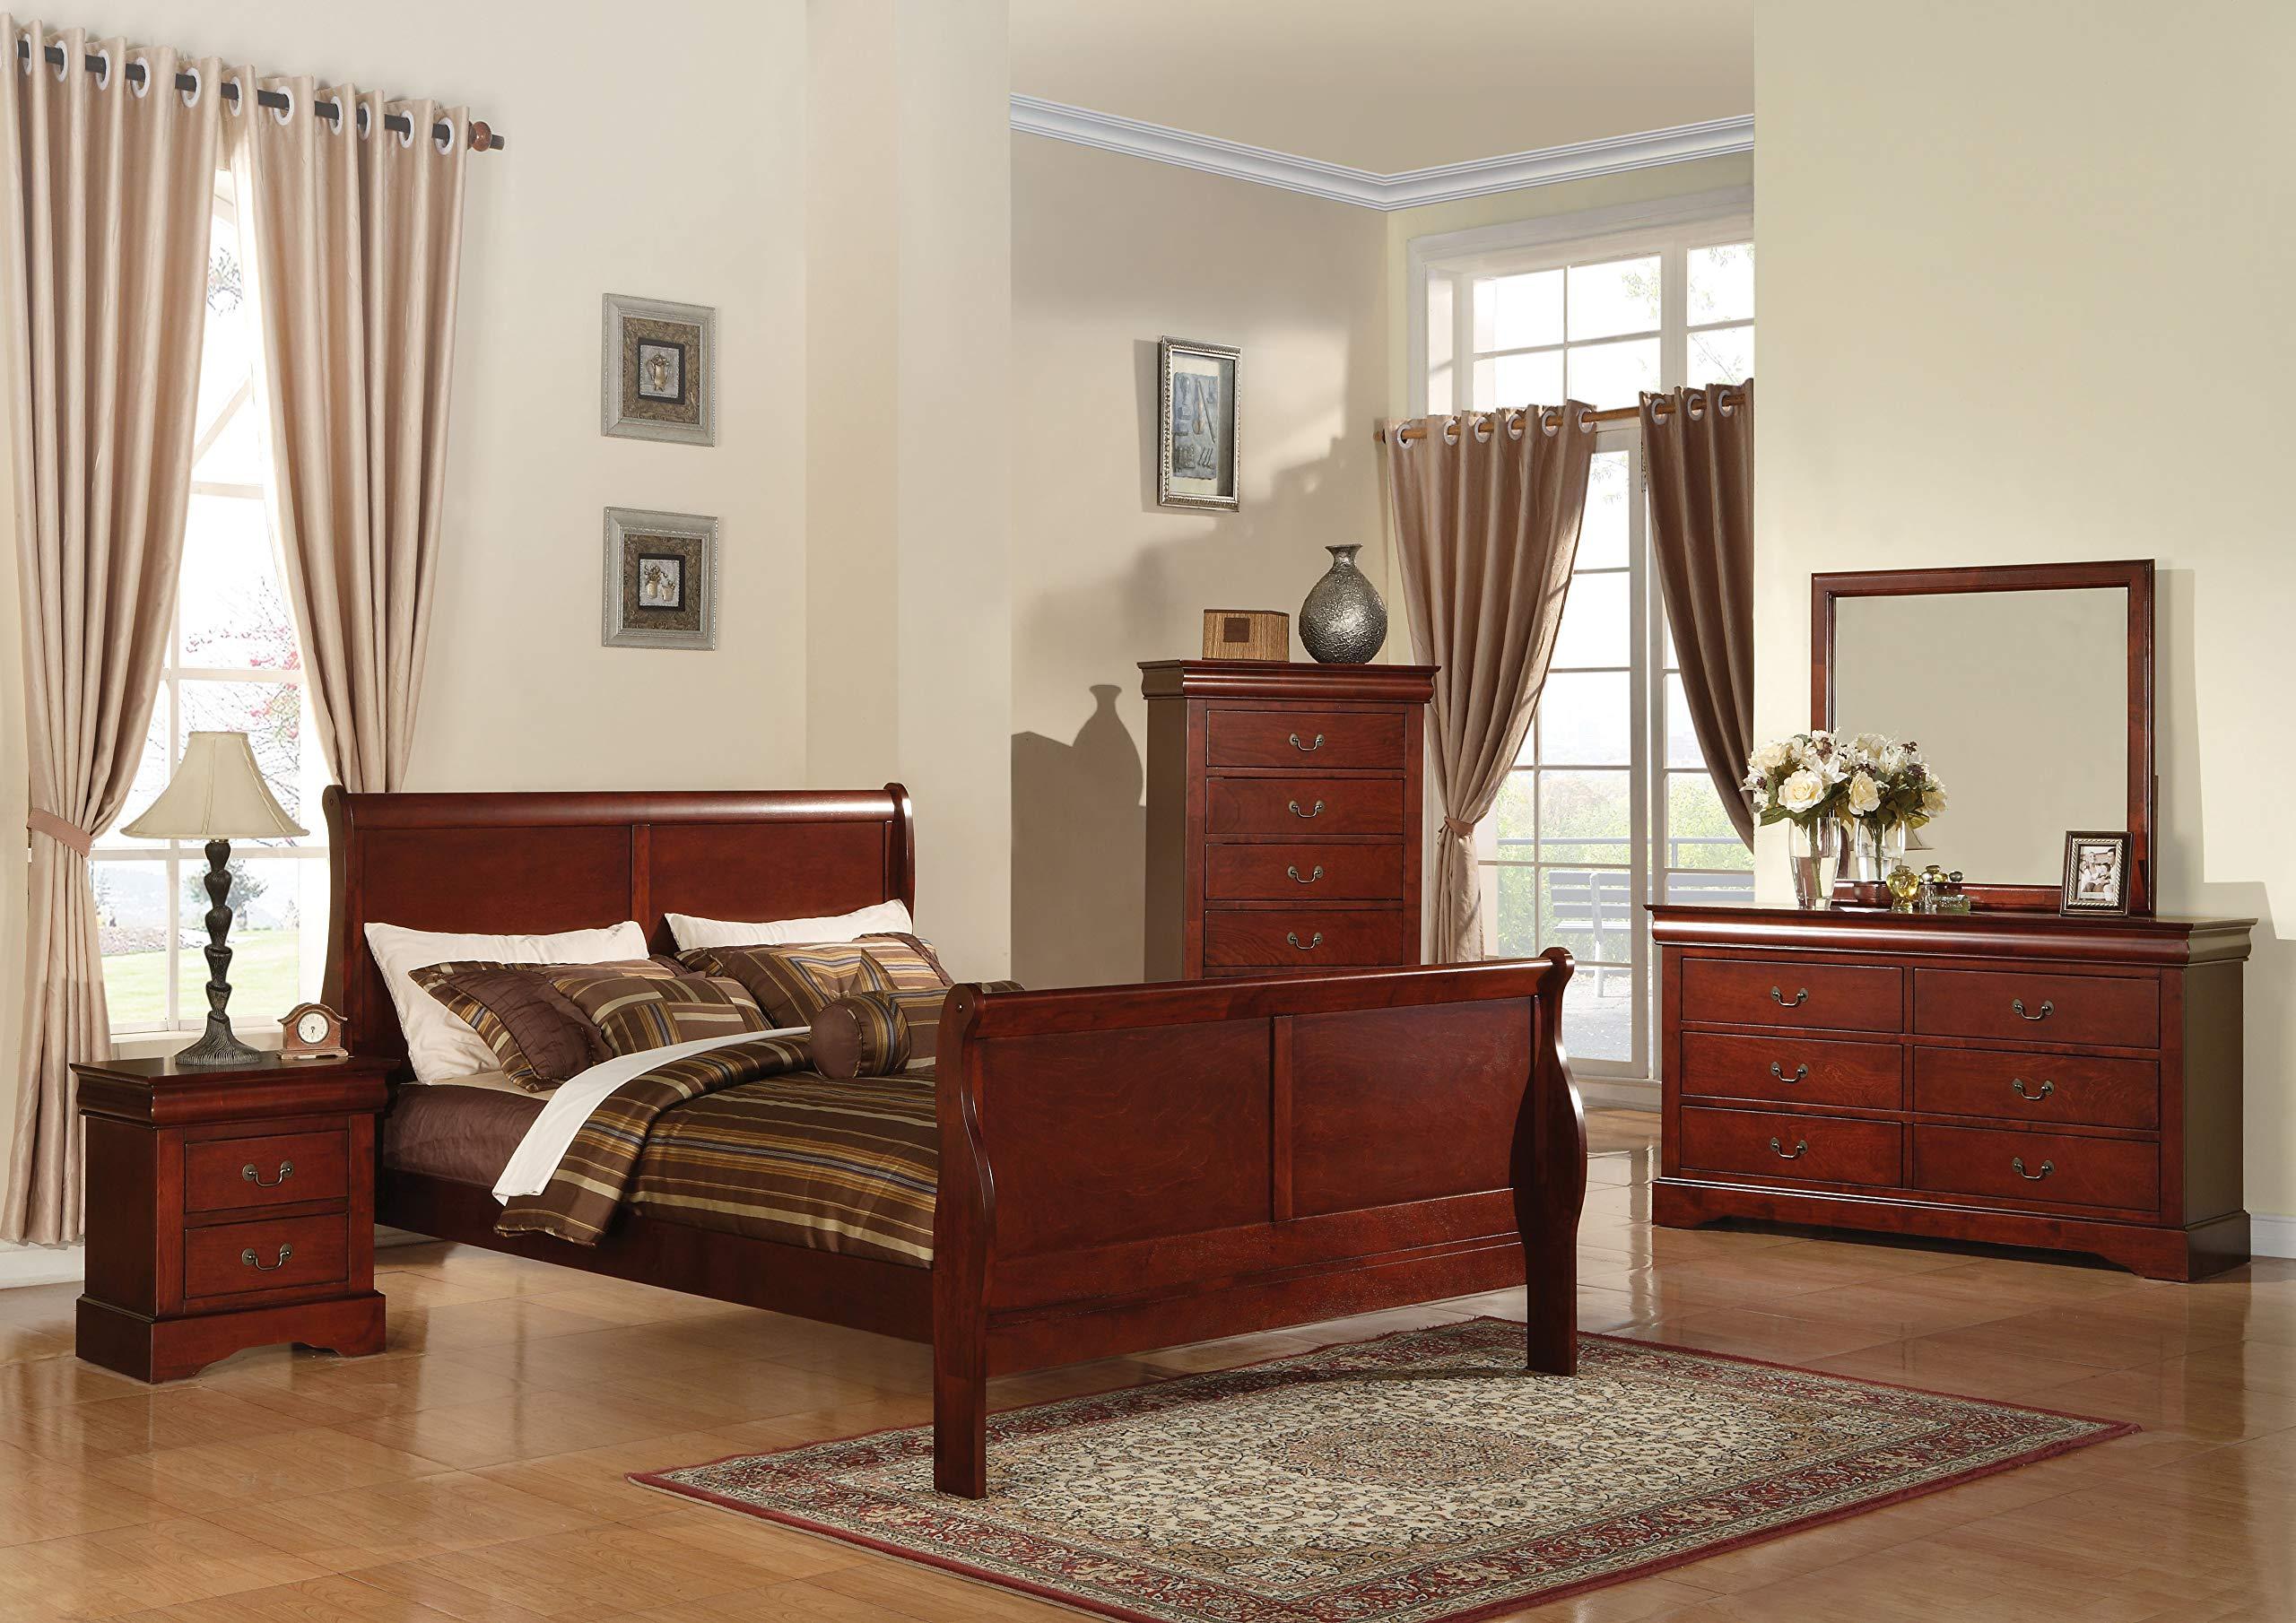 acme 19514CK Louis Philippe III California King Bed, Cherry Finish